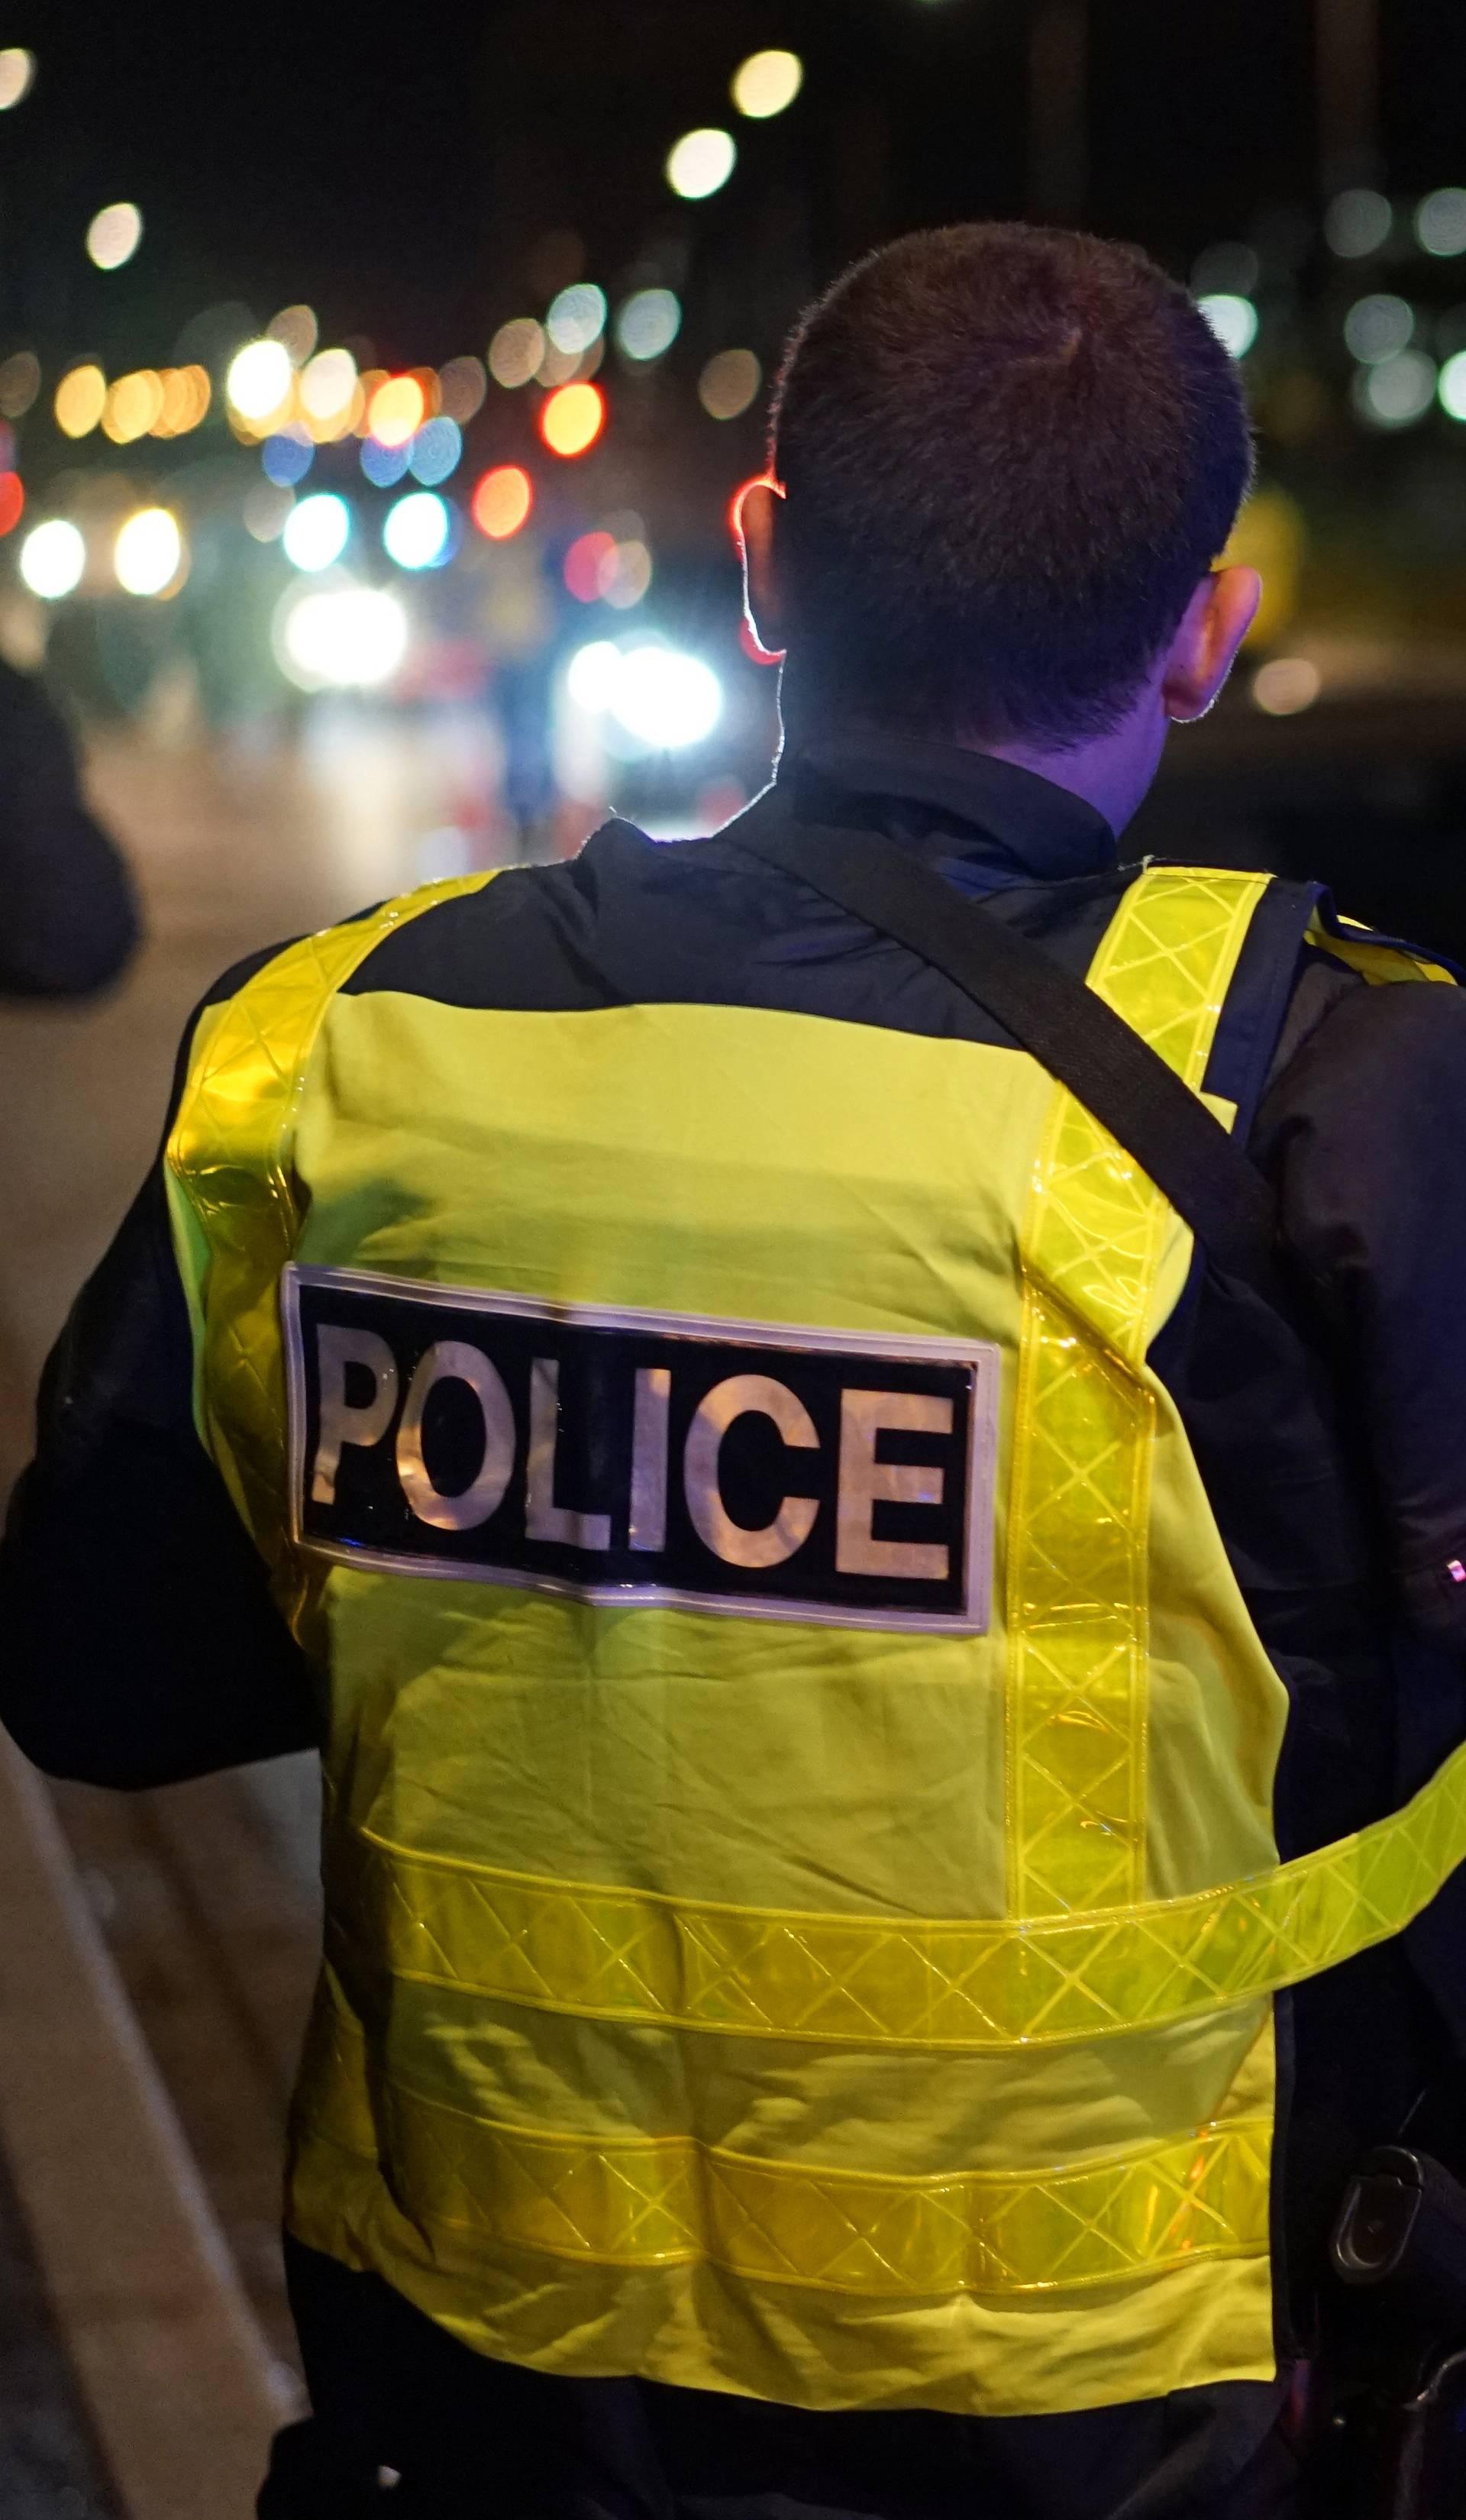 Aftermath of Paris attacks - France reinstates border controls